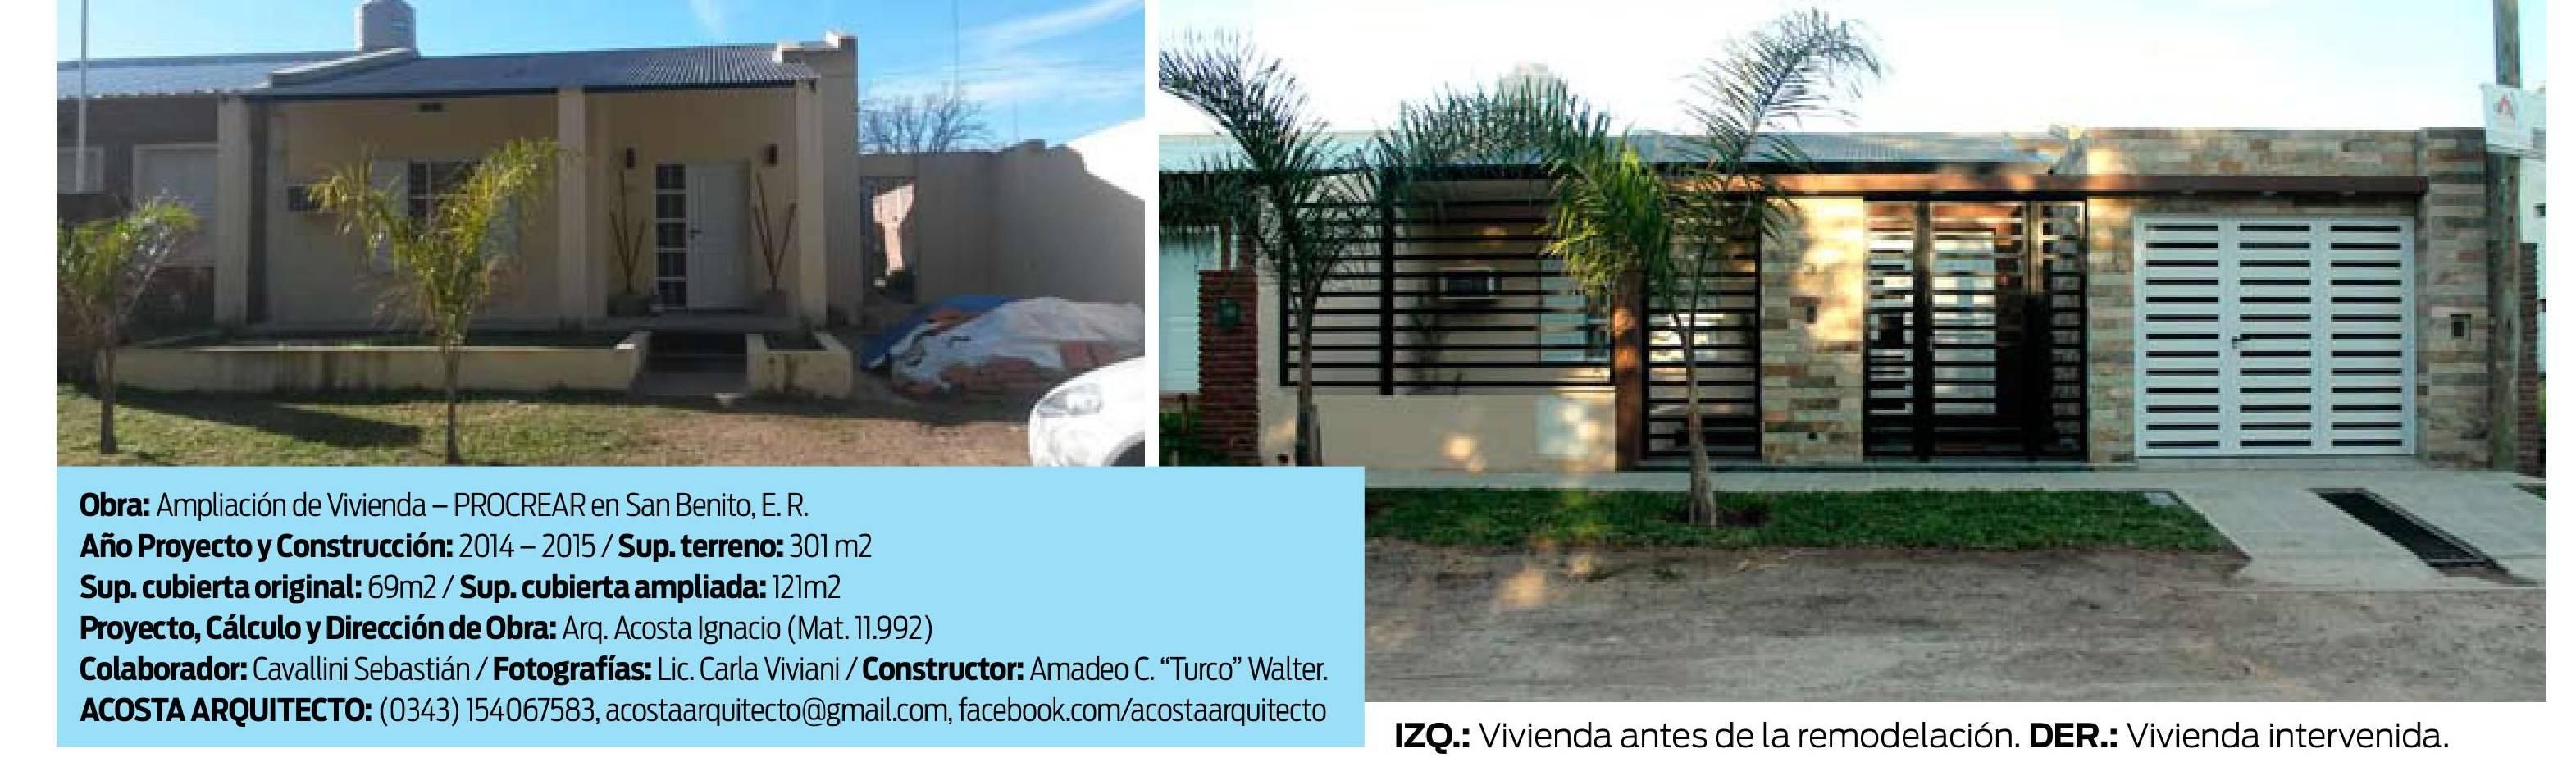 AA – Estudio de arquitectura